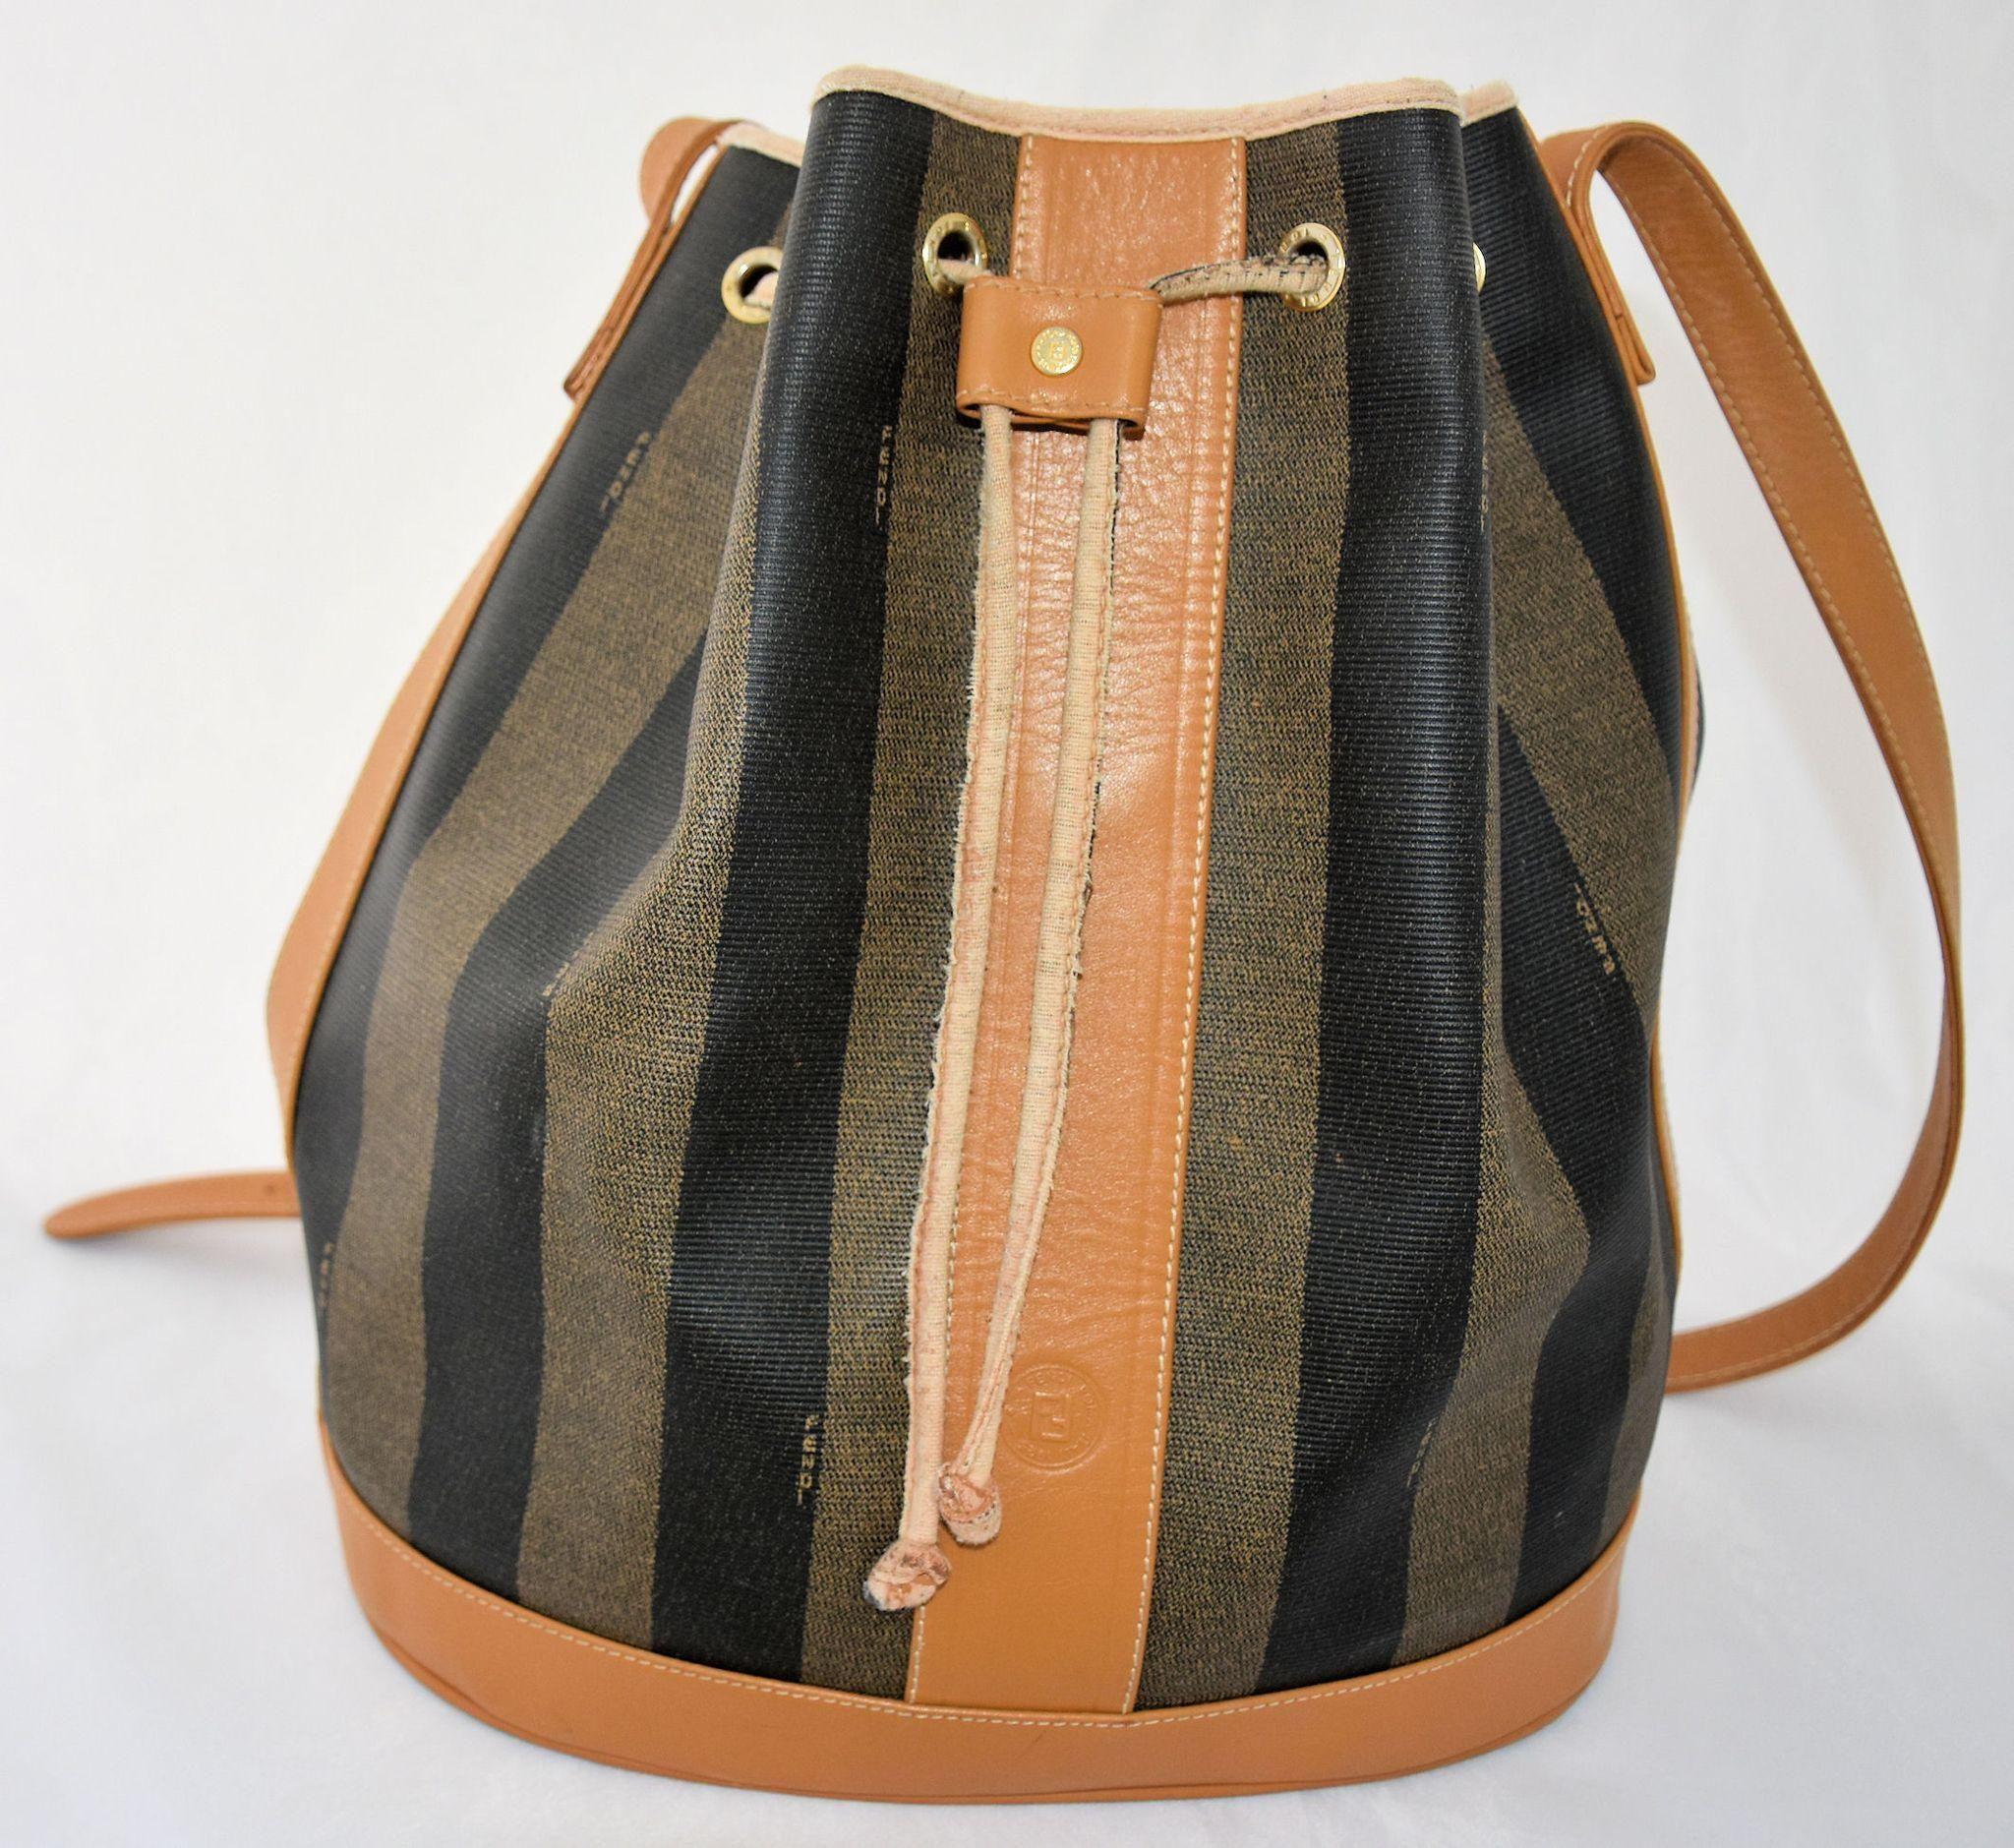 ad8a425f56ce Vintage Fendi Shoulder Bucket Bag Classic Stripe Drawstring Purse Large Tote  Handbag Made in Italy from  antikavenue on  rubylane  Fendi   vintagehandbags